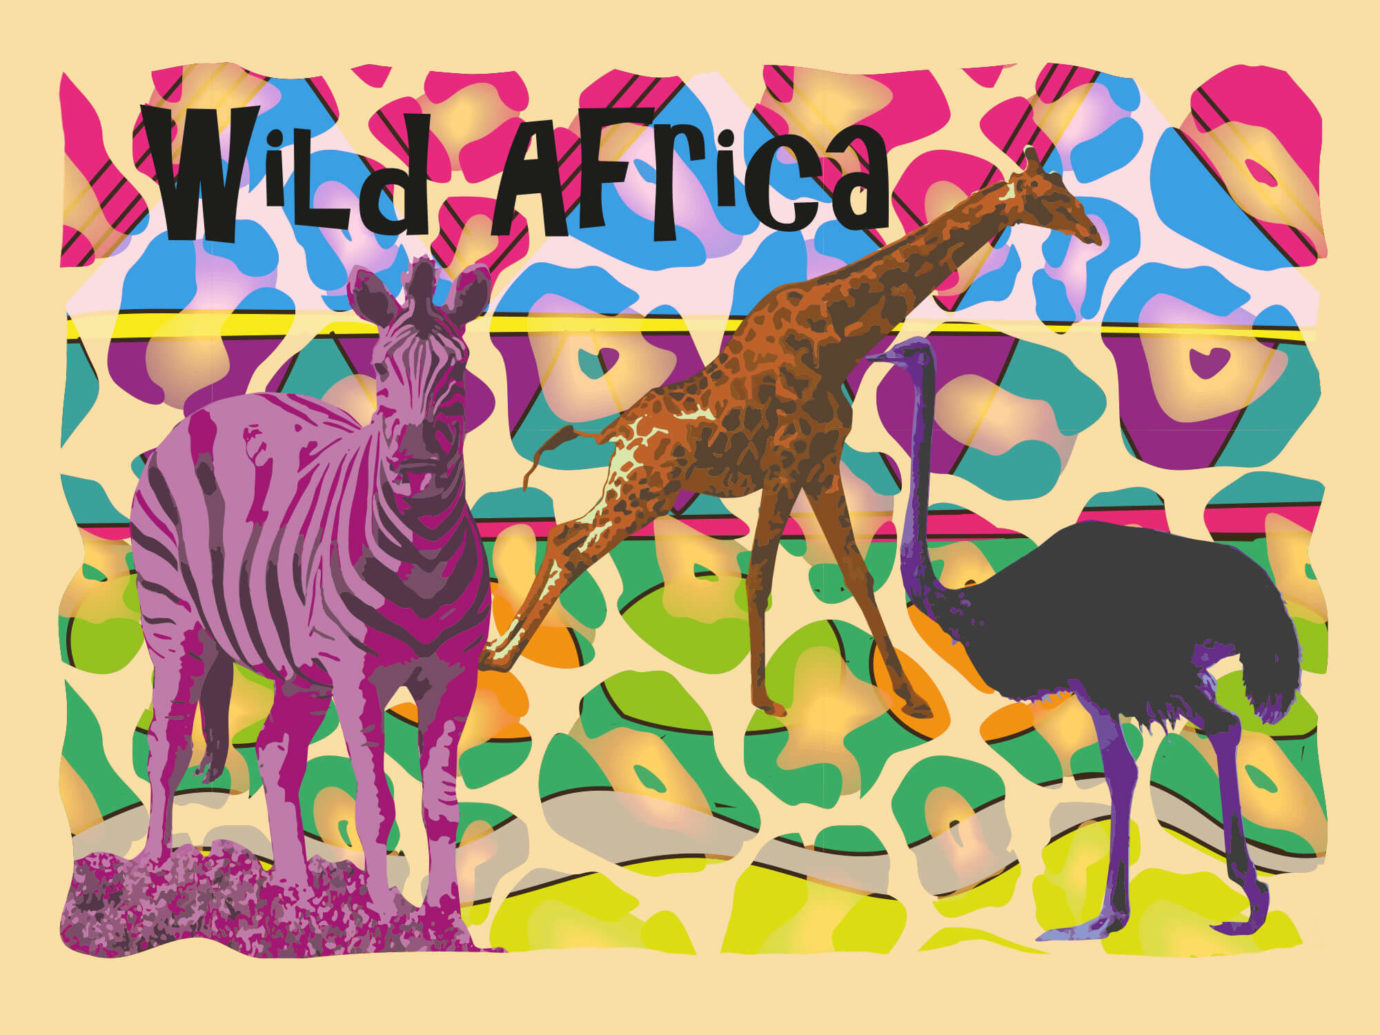 Illustrator-Design von Sylvia Leister